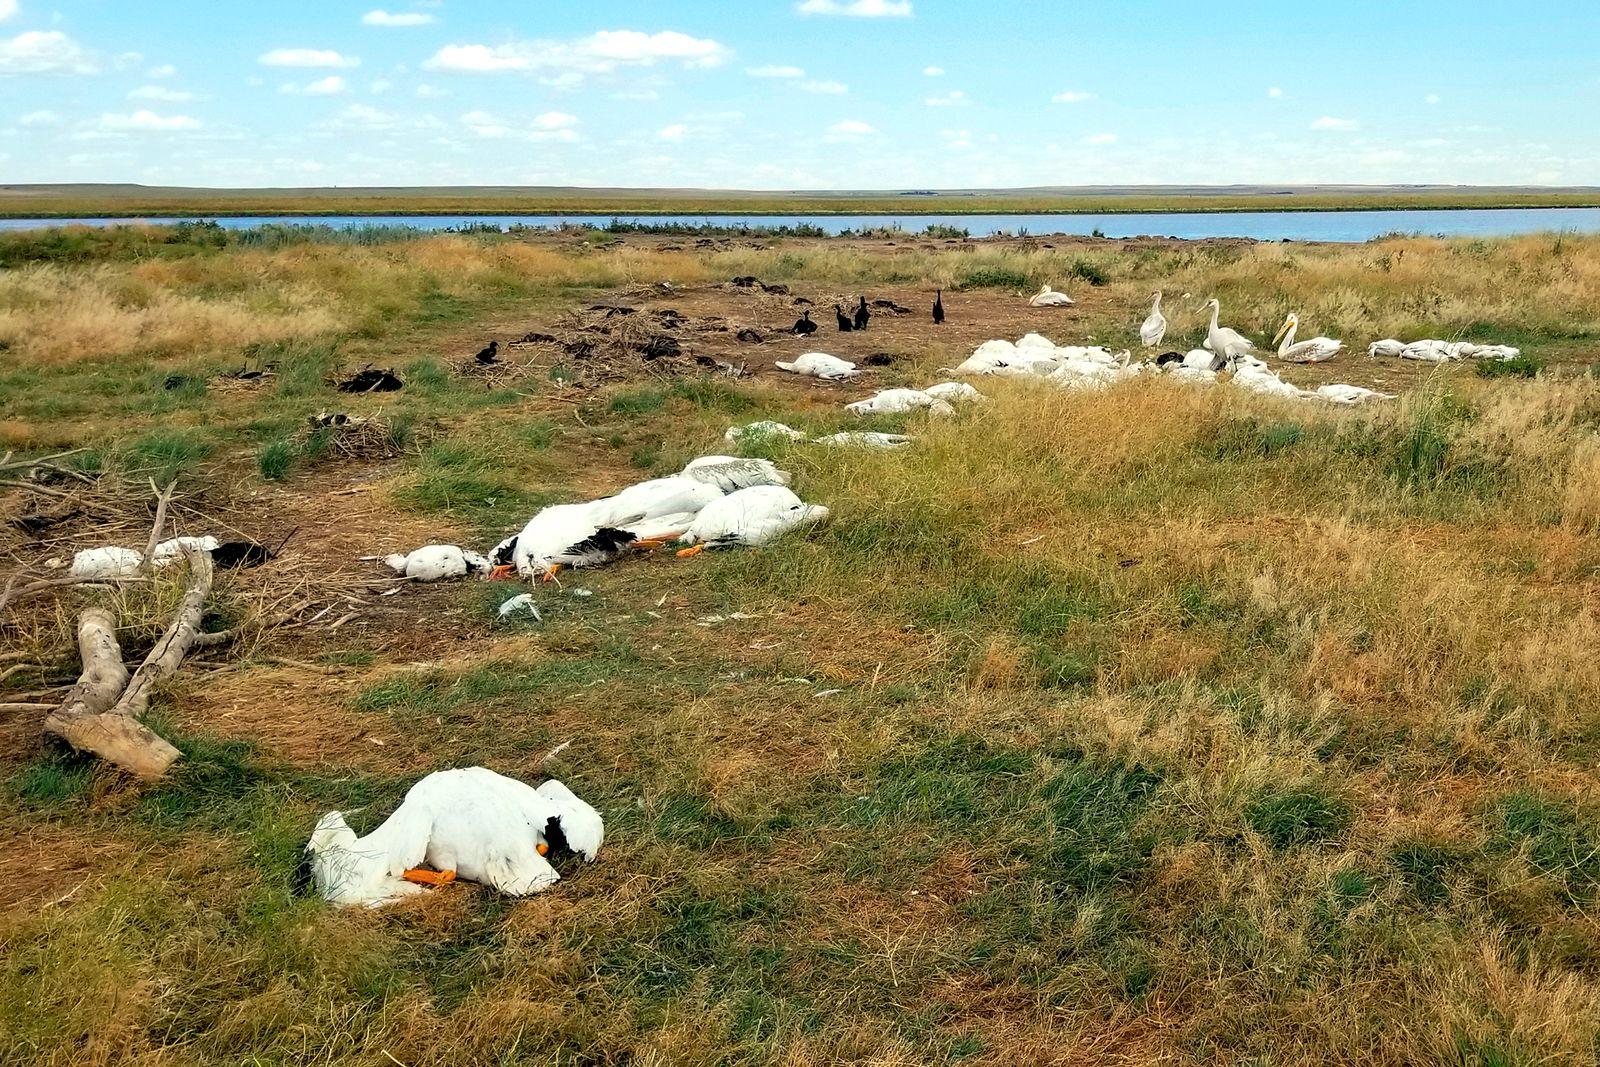 Birds Killed Hailstorm